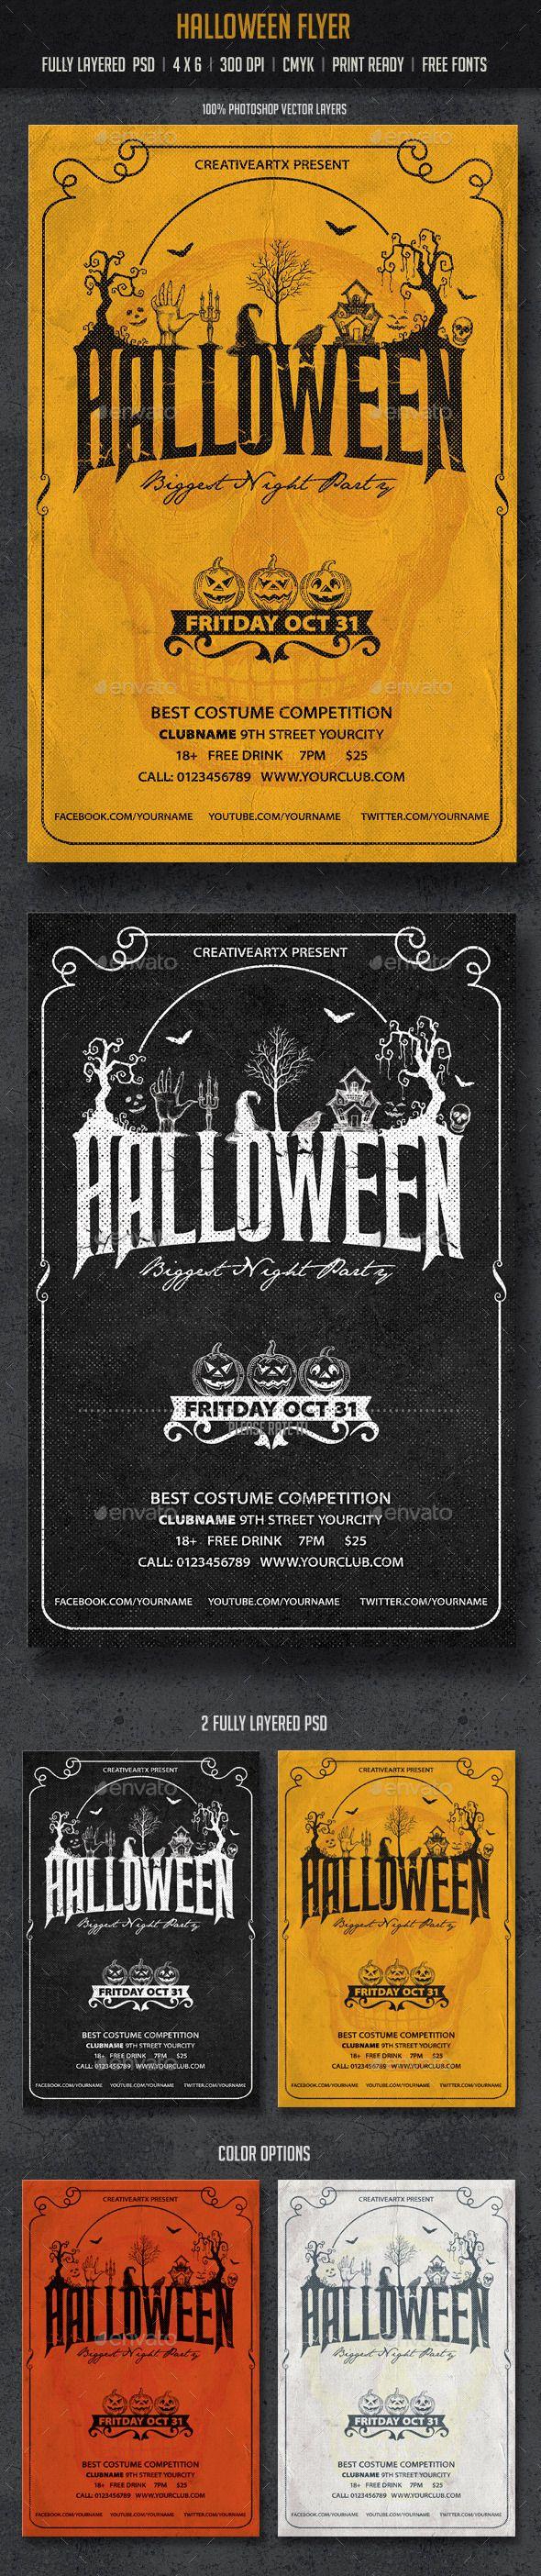 Halloween flyer flyer template halloween and design for Halloween flyer ideas